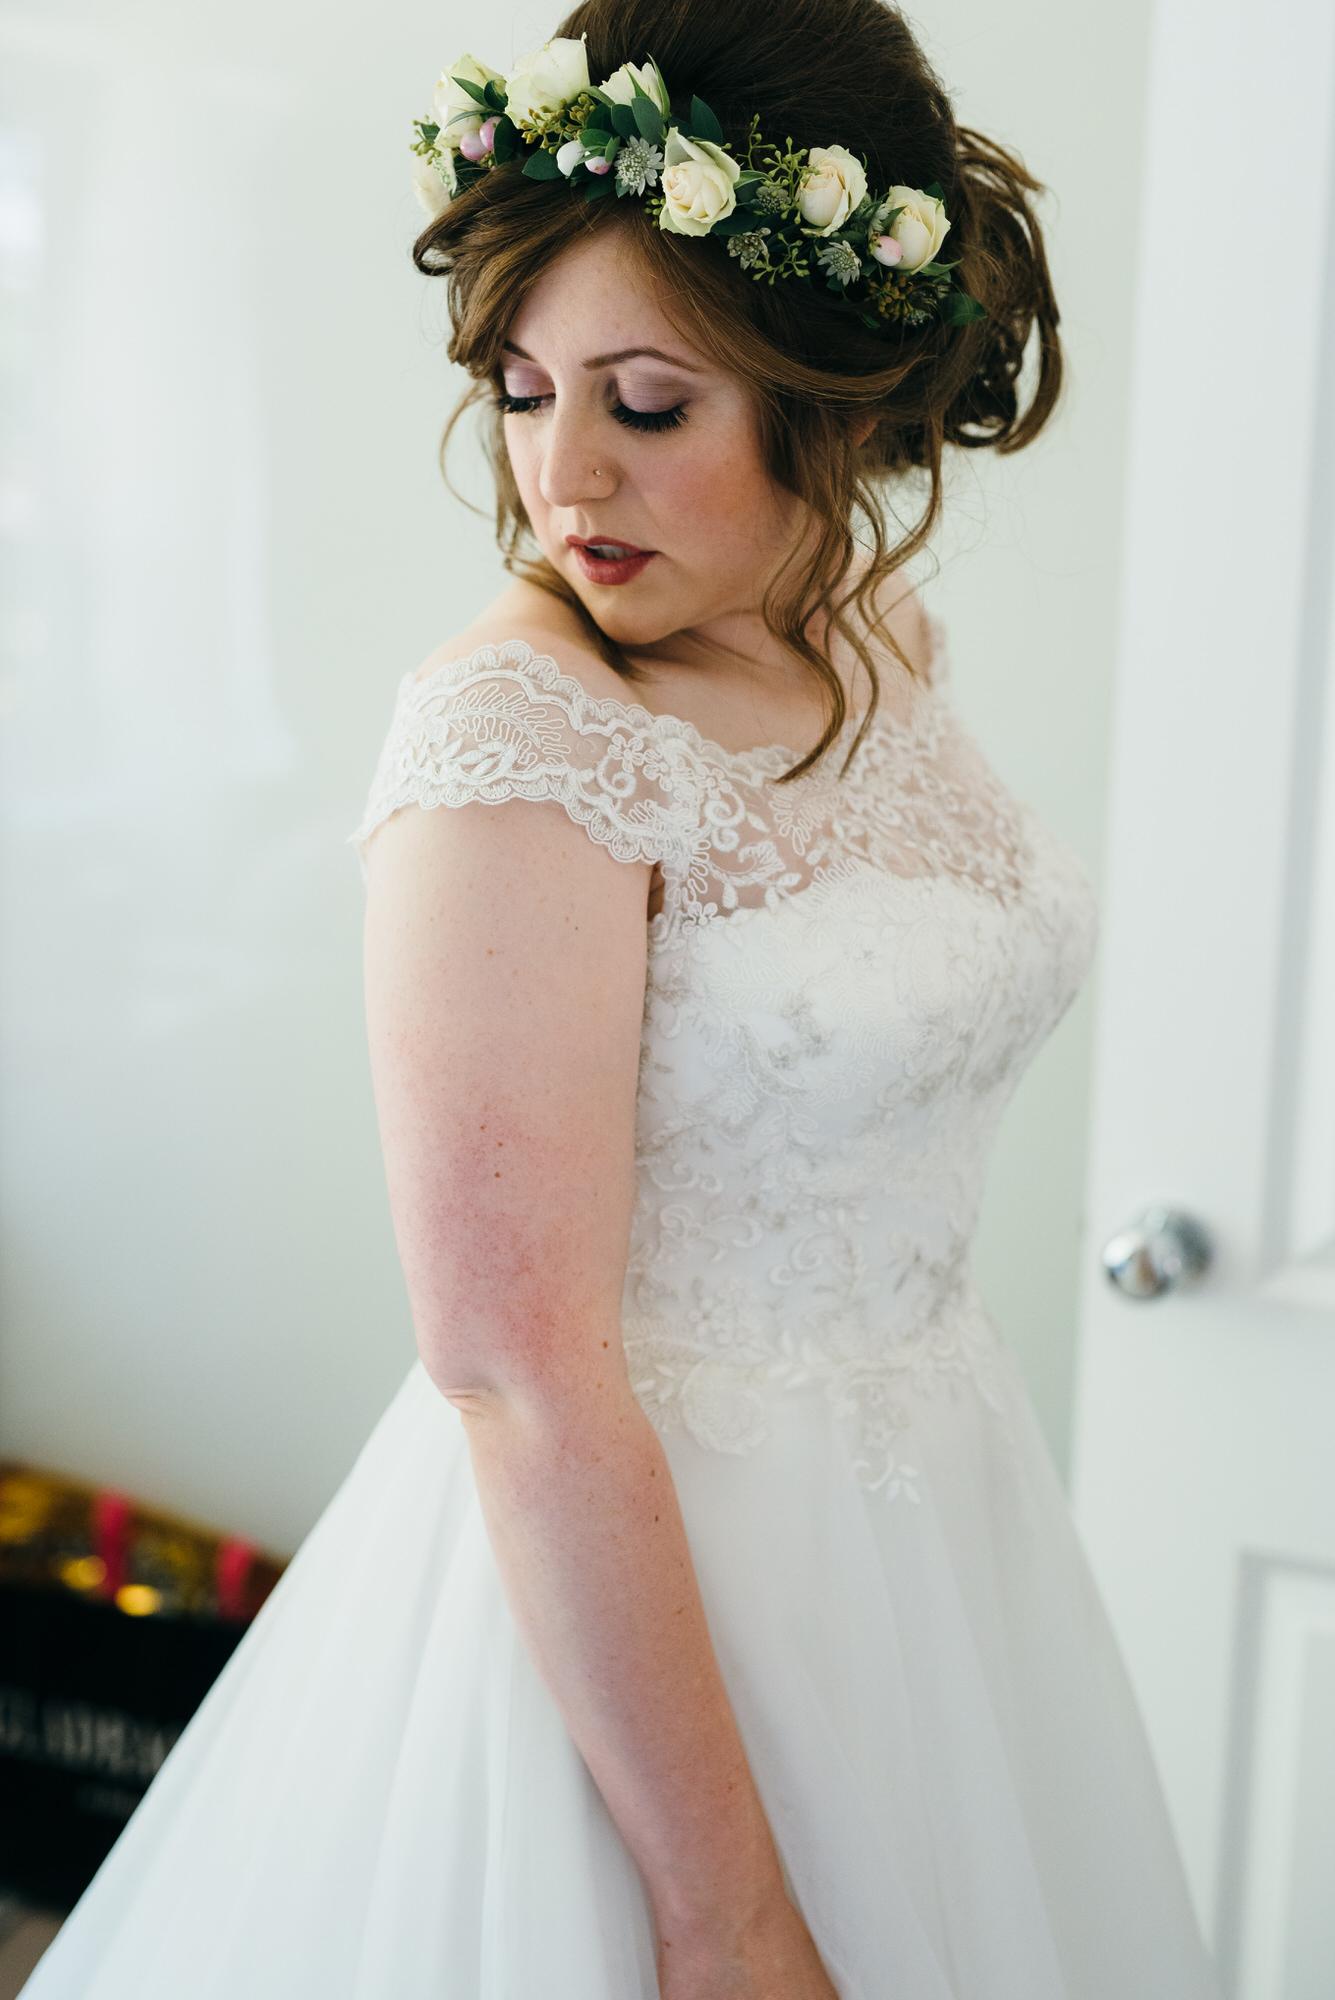 Colville hall Bride in wedding dress